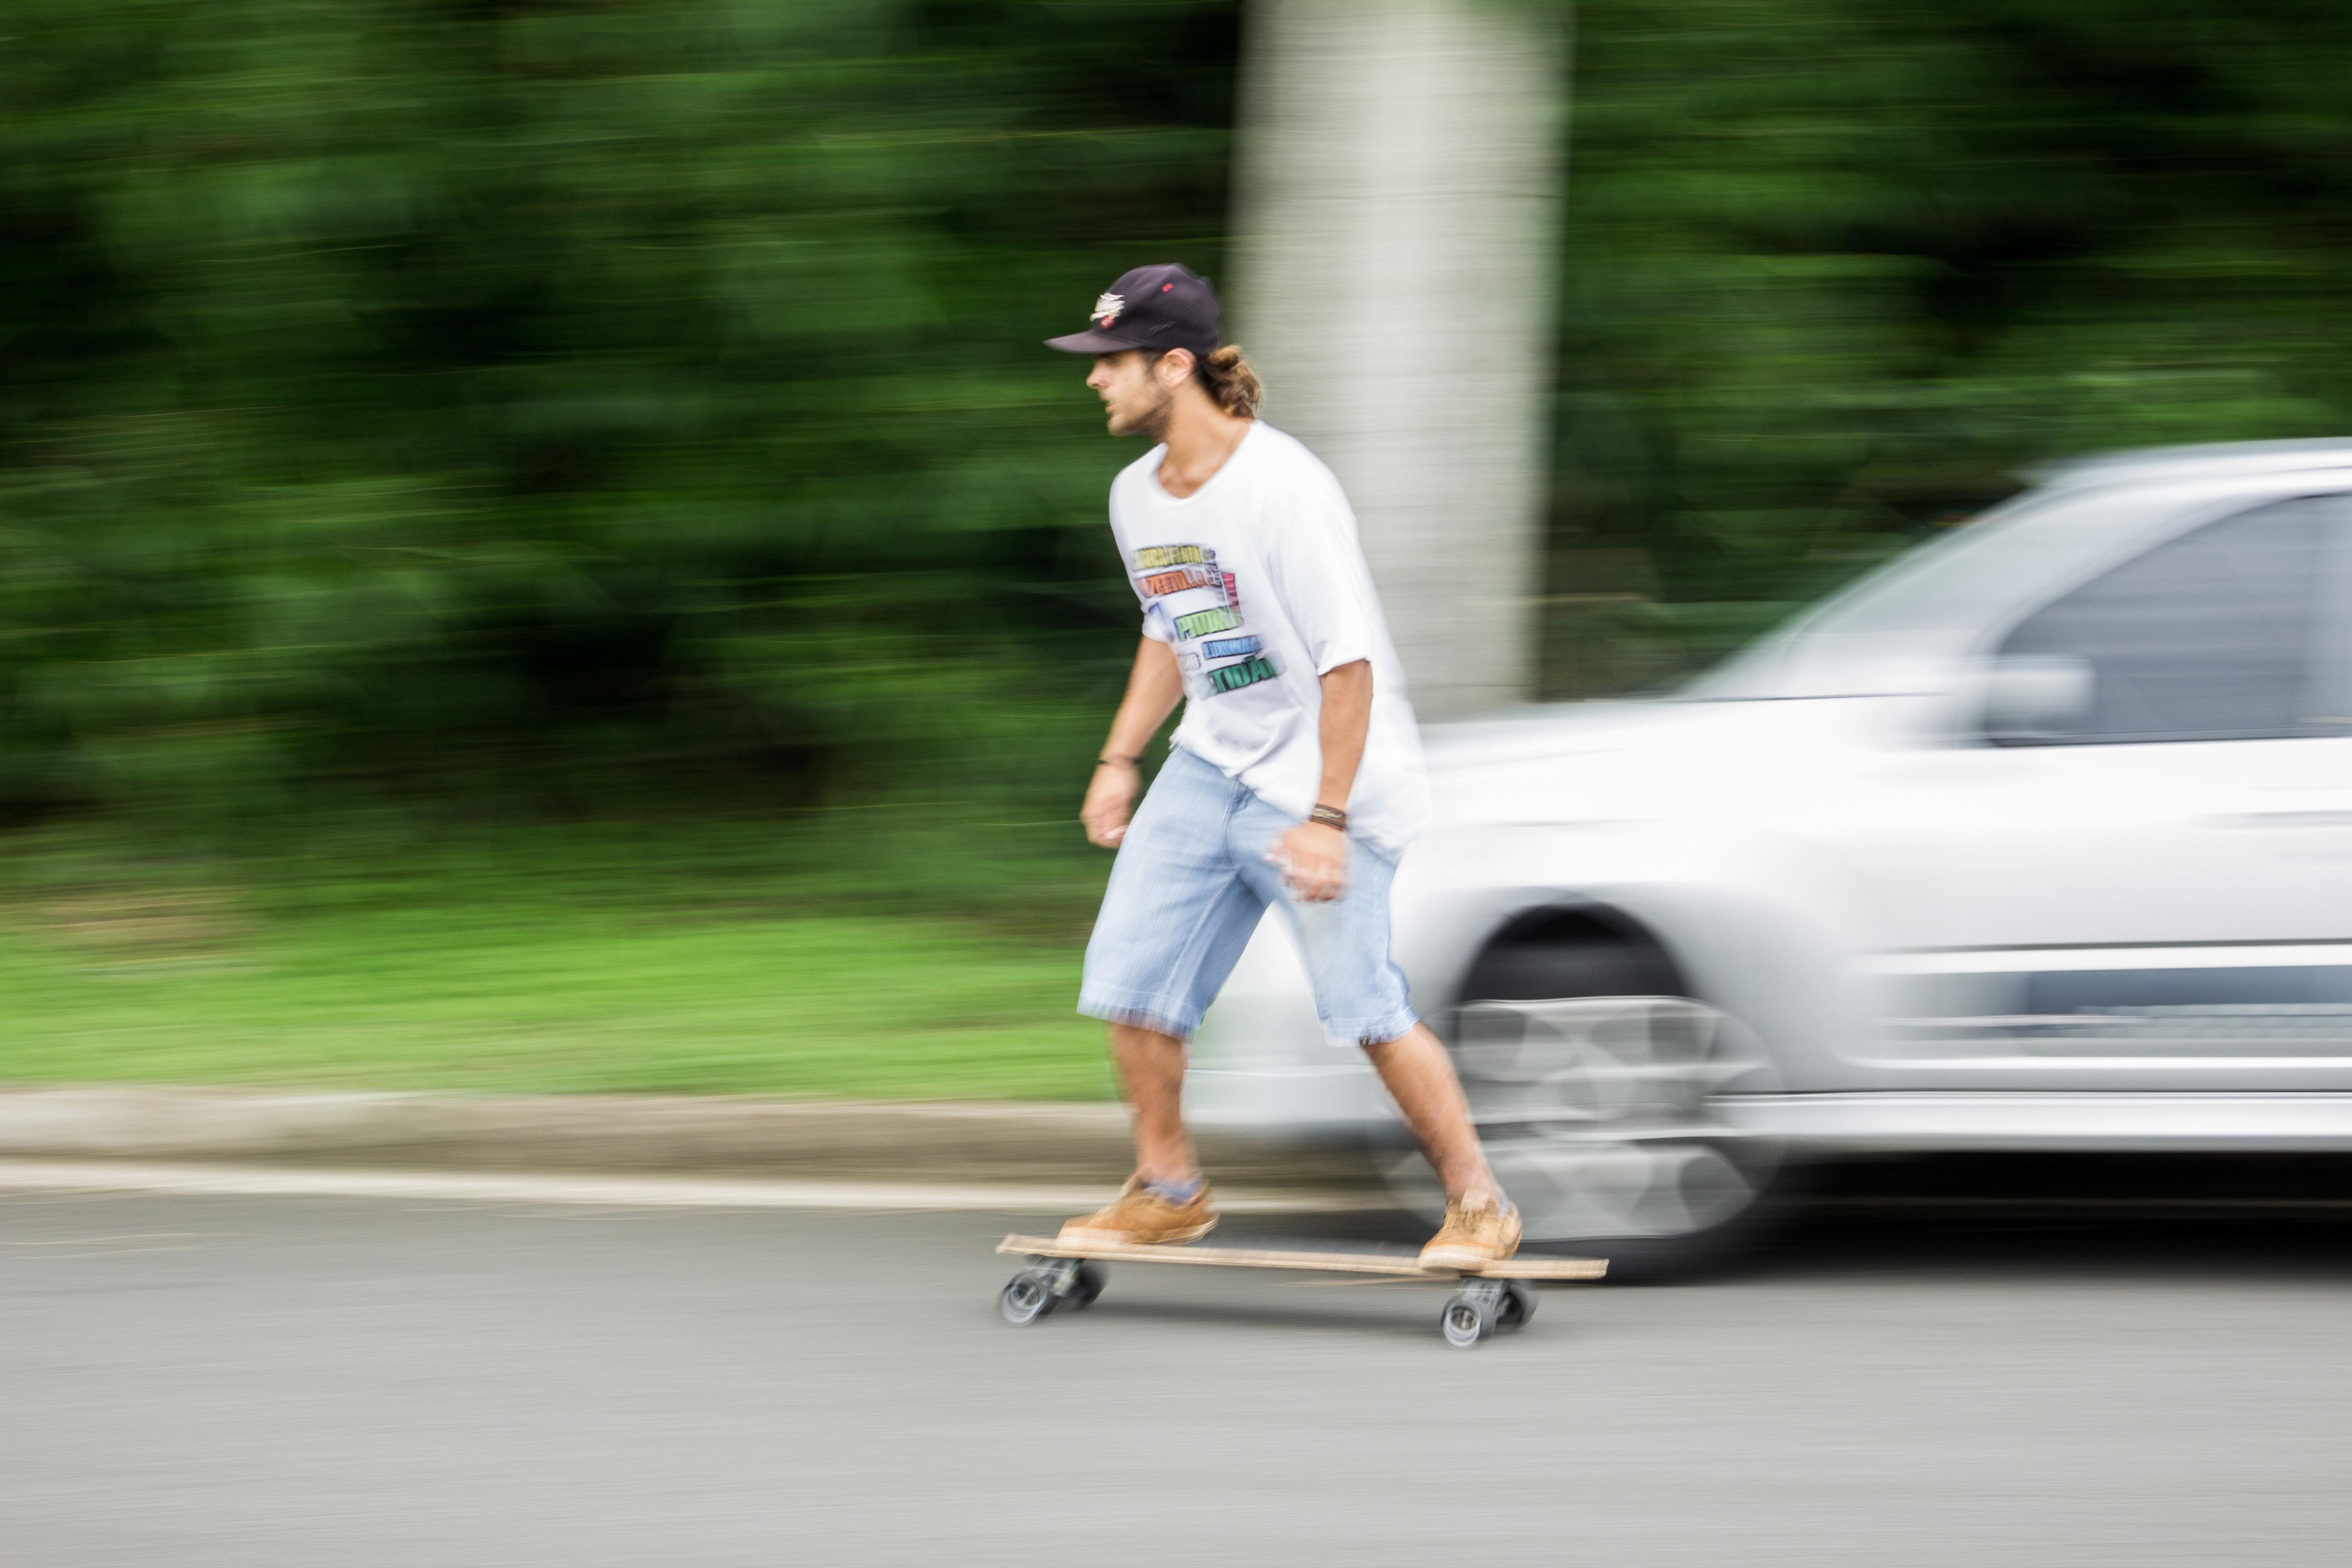 Man playing longboard on road photo